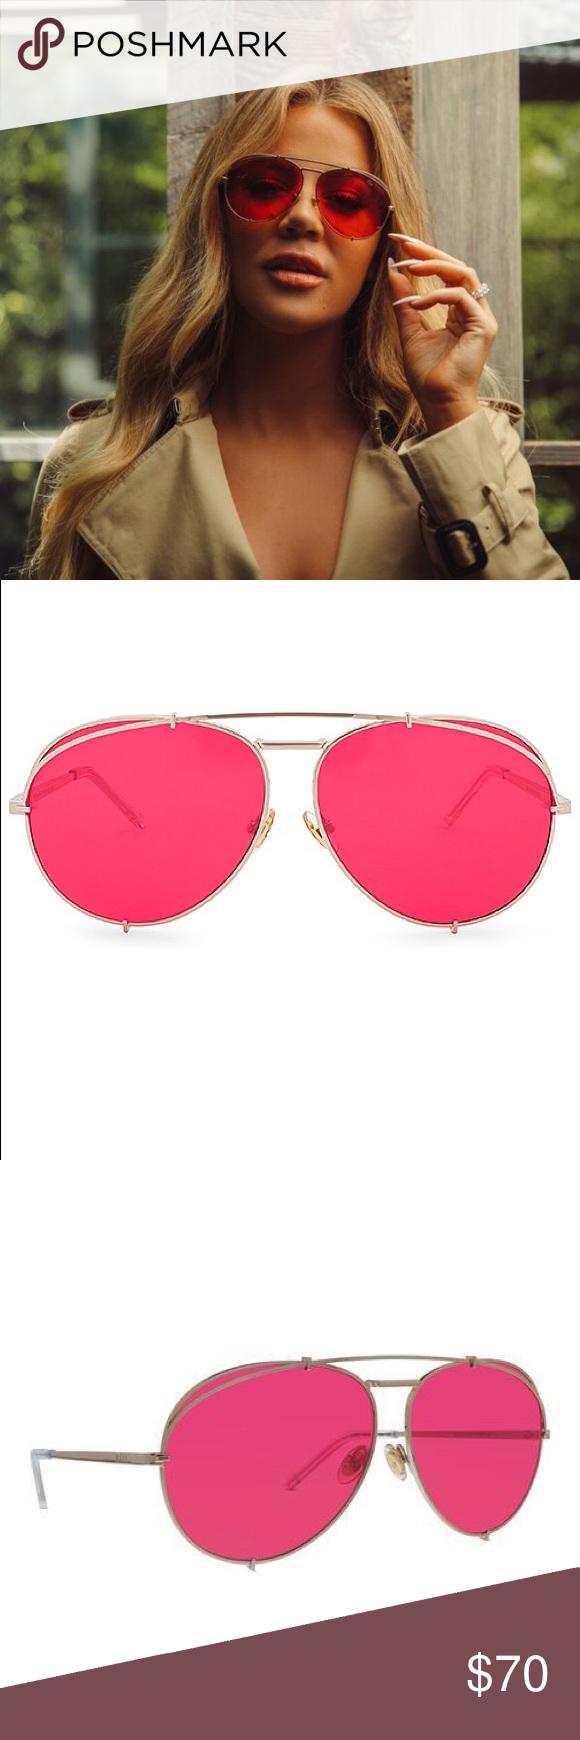 9a444329fd83c NWOT Diff Eyewear Koko Khloe Kardashian Sunglasses NWOT